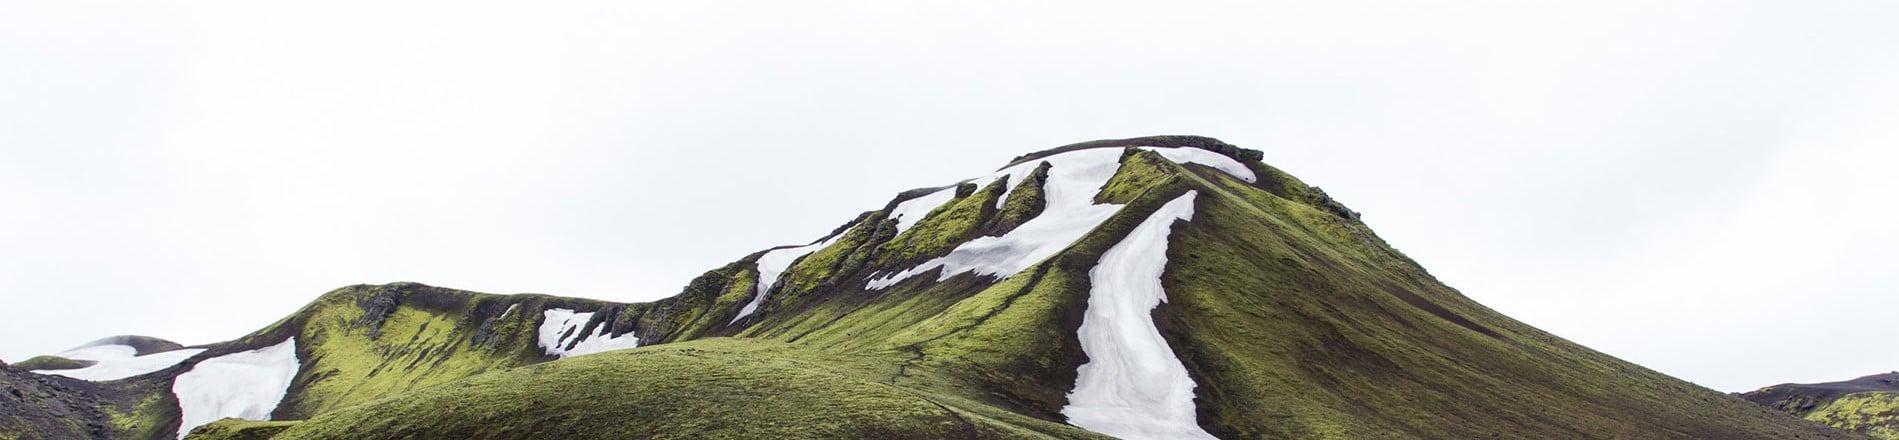 blog voyage, montagne